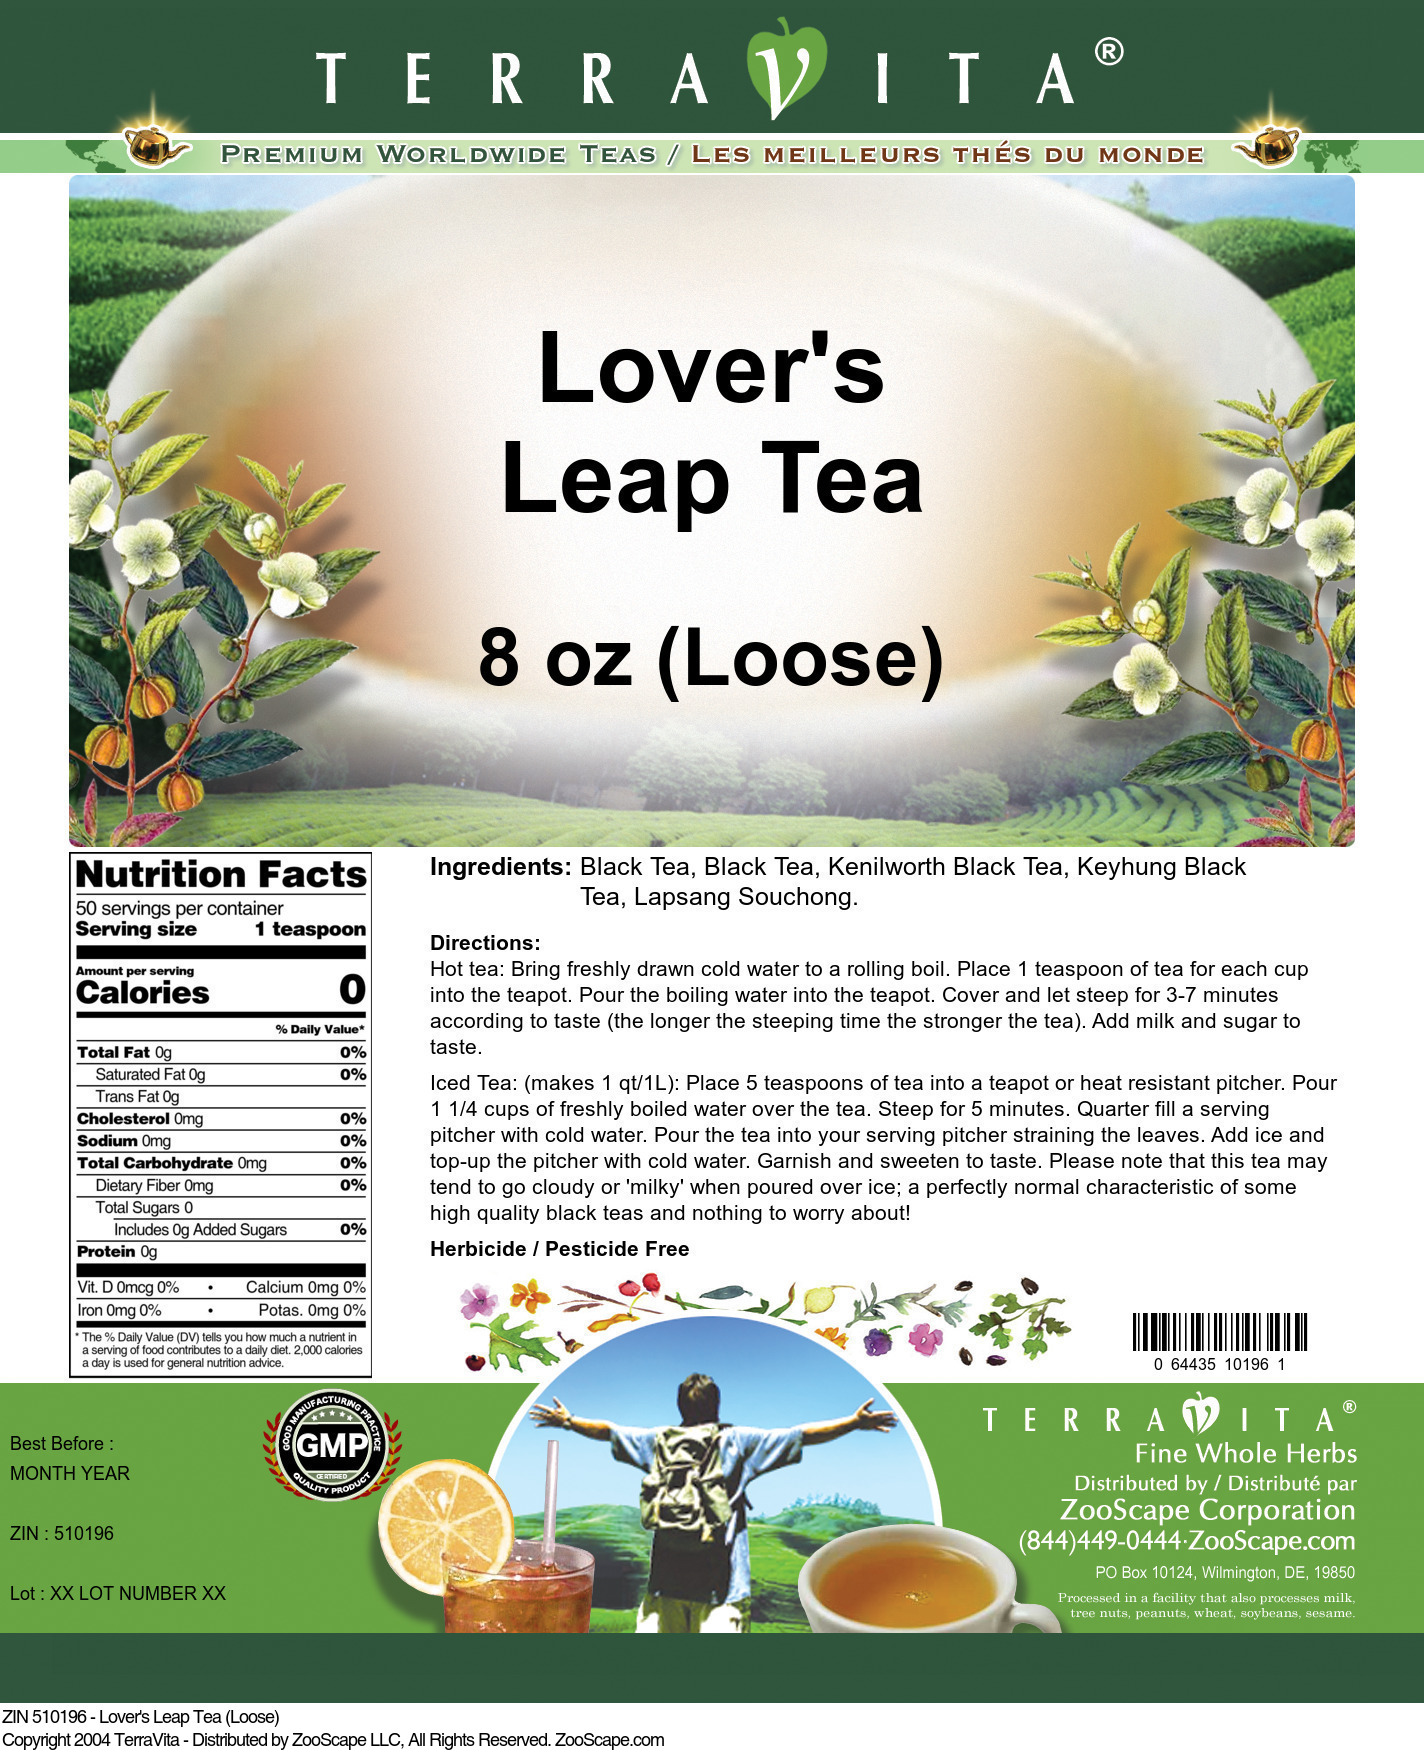 Lover's Leap Tea (Loose)